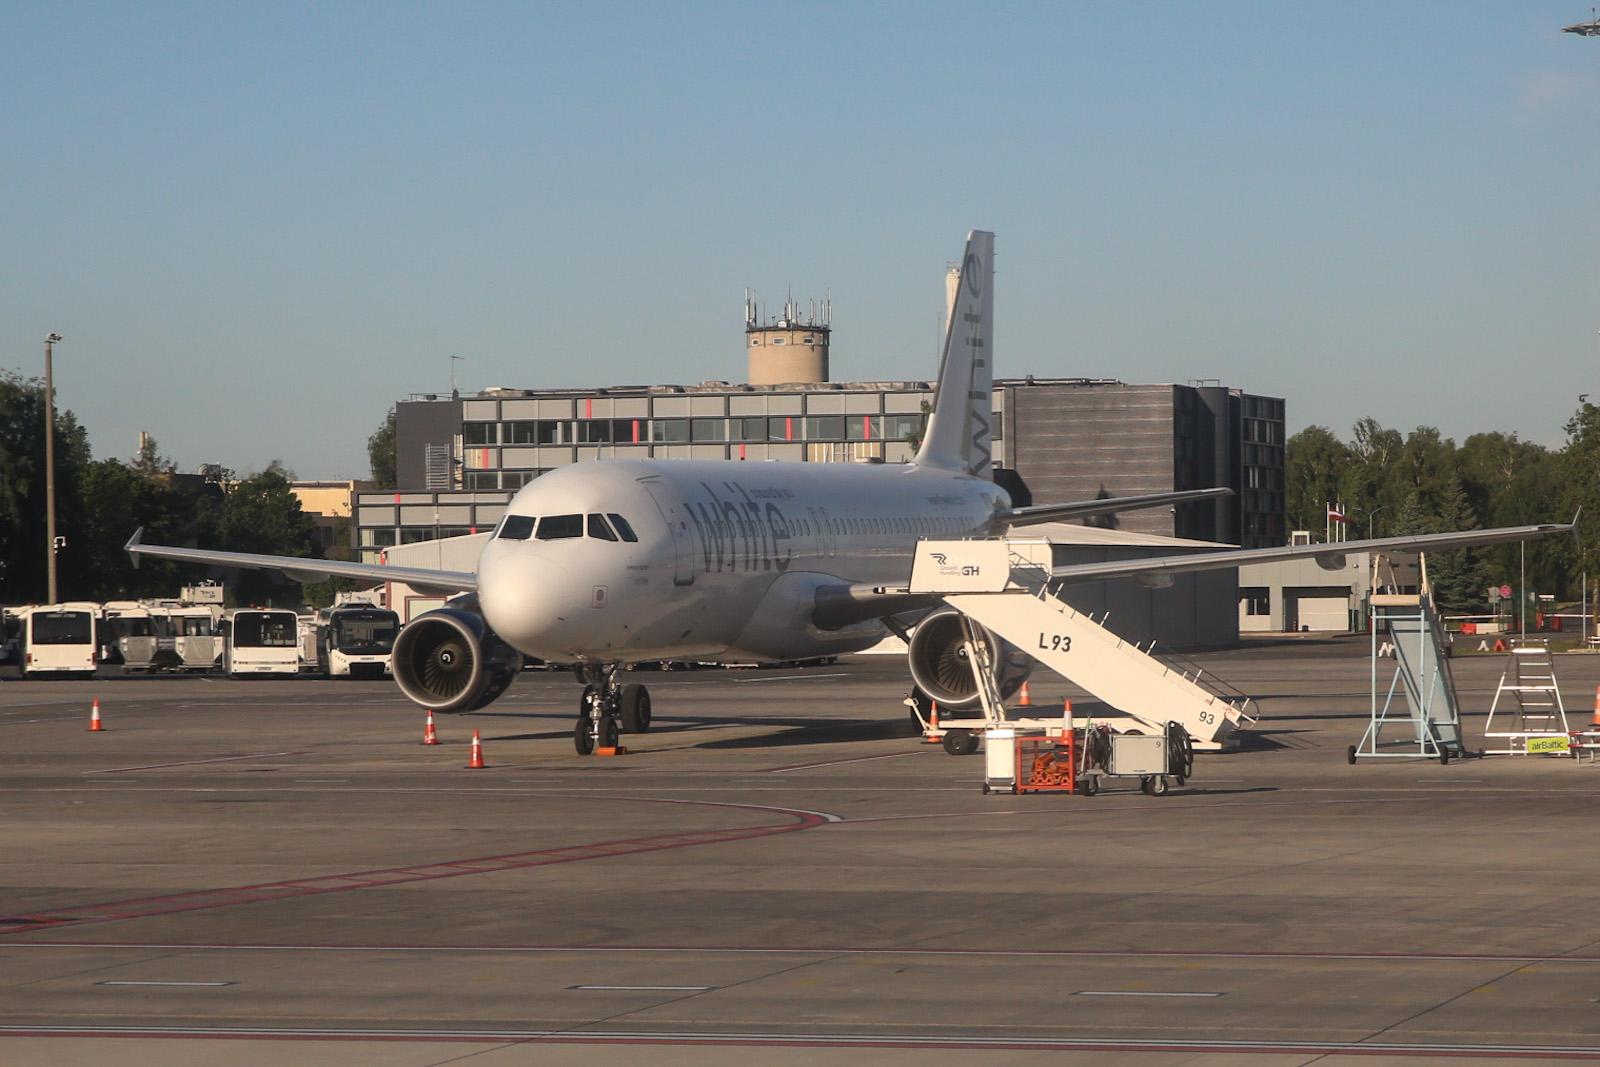 Airbus A320 авиакомпании White Airlines в аэропорту Рига